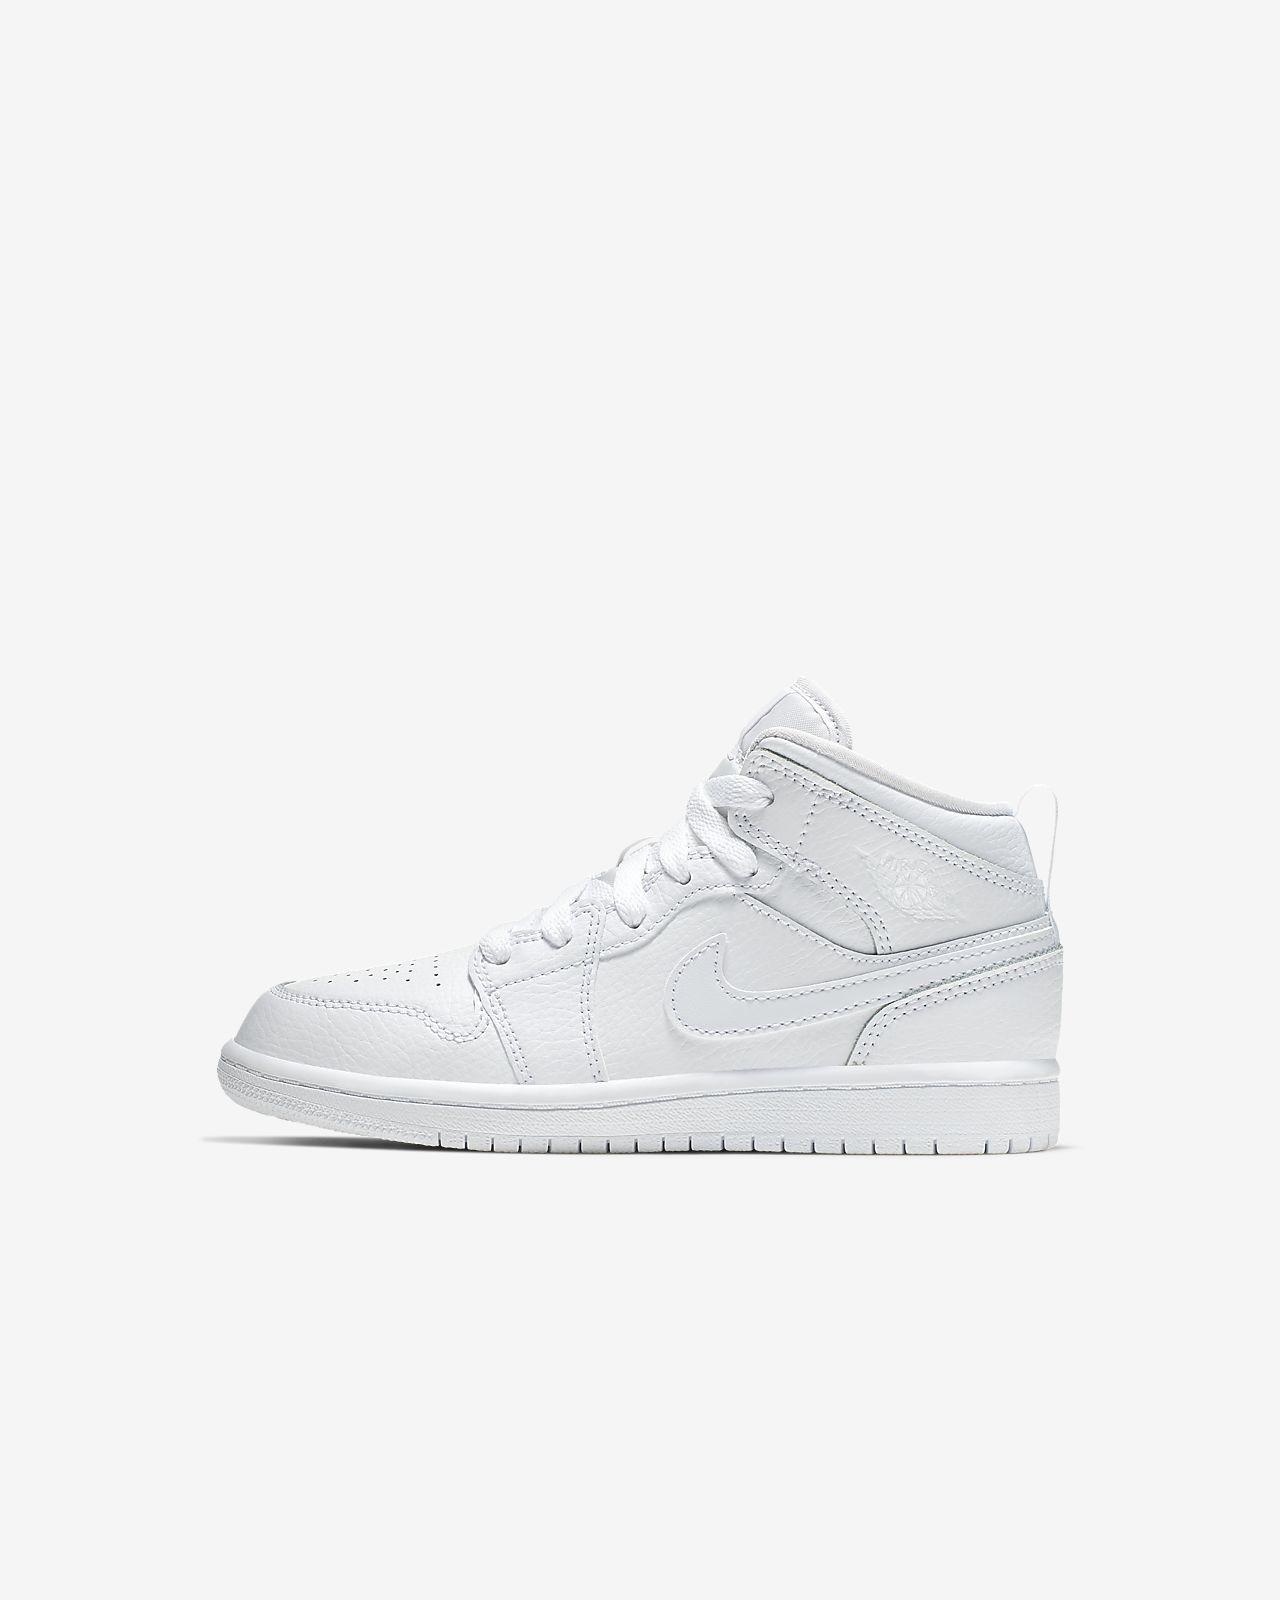 Air Jordan 1 Mid sko for små barn